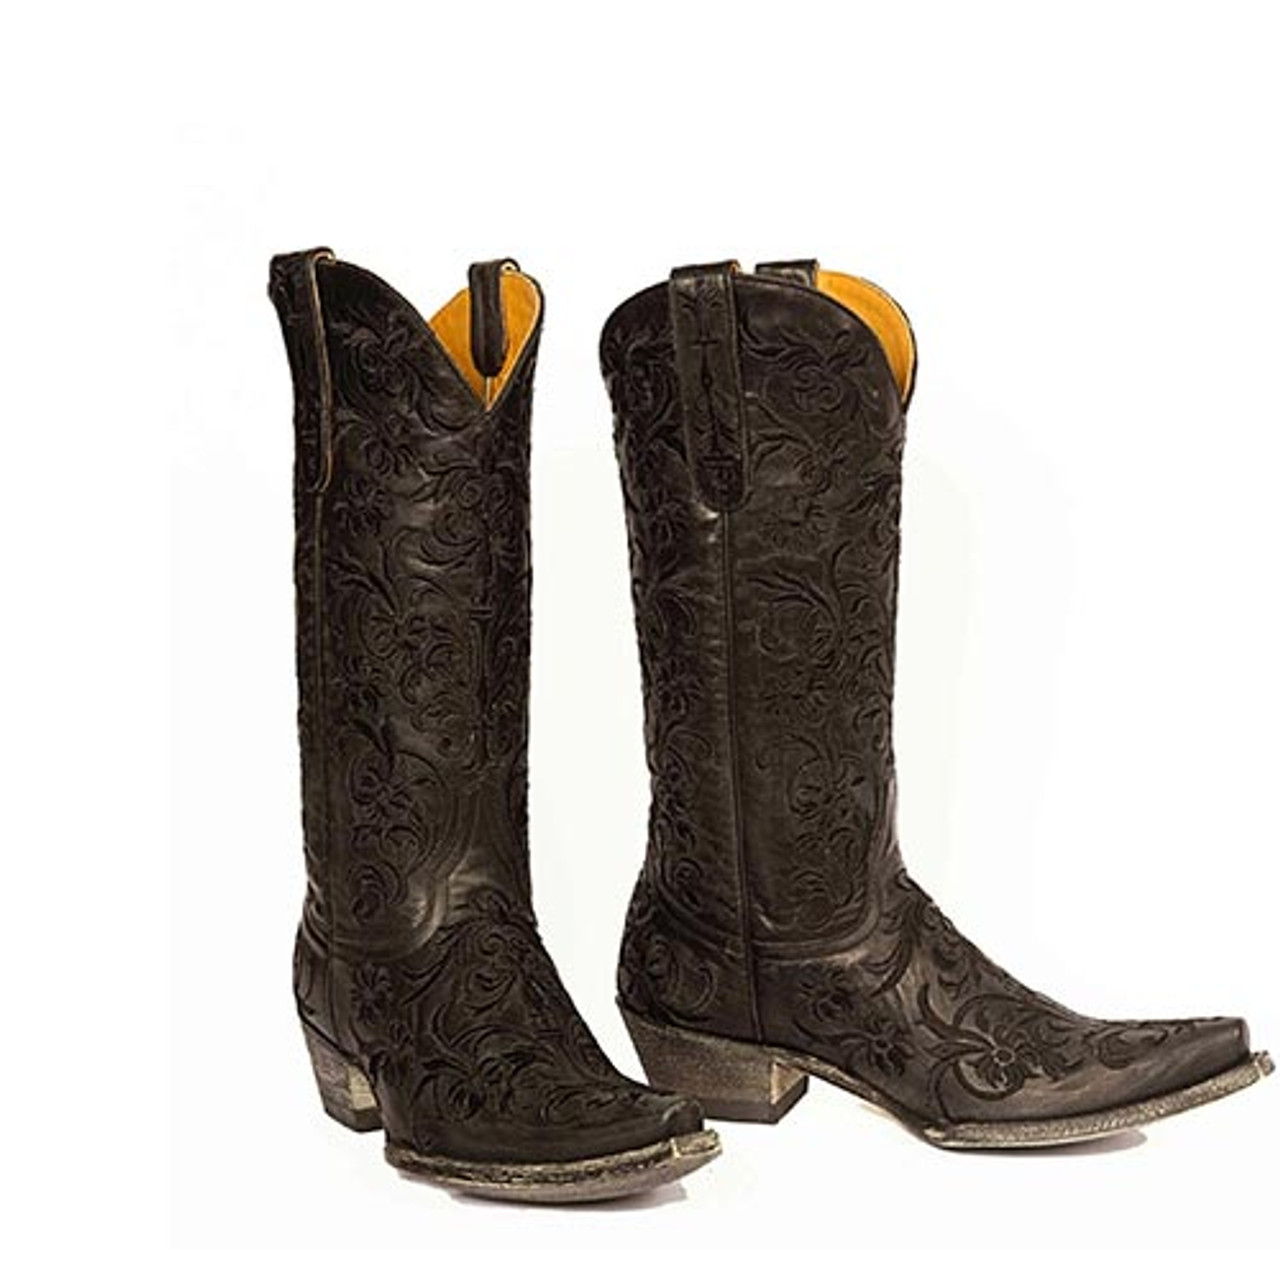 86ccfb593127f8 Old Gringo Women's Boots - Clarise - Black - Billy's Western Wear